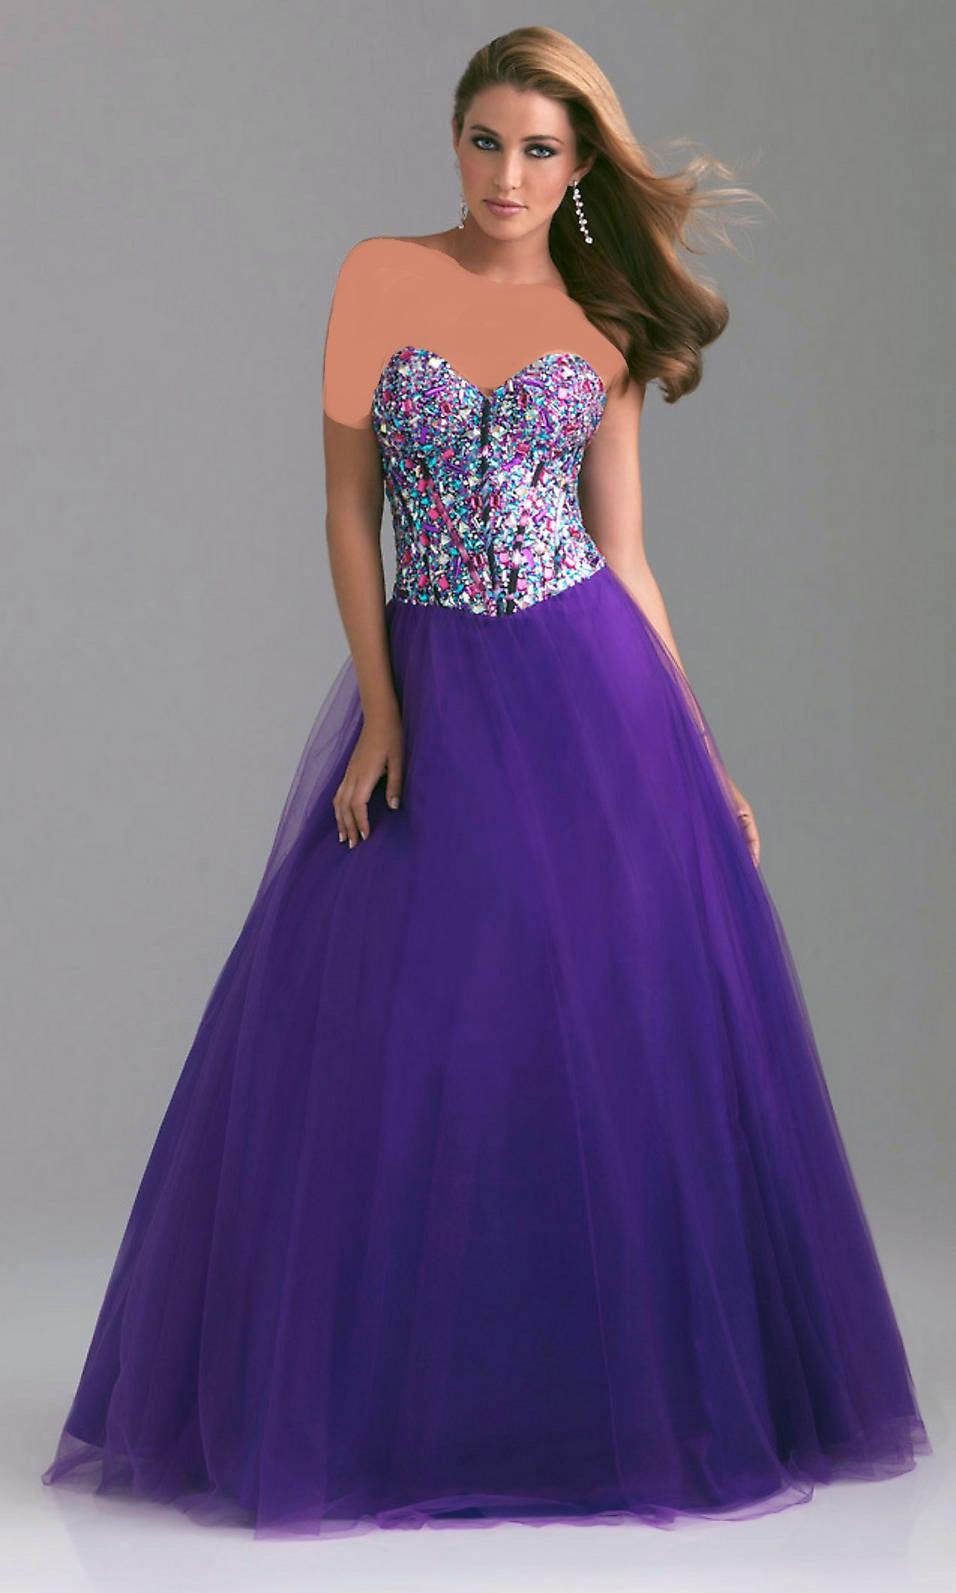 http://www.uplooder.net/img/image/59/b15dec65c6e7c79be2e354a66bd40bf6/long-strapless-purple-prom-dresses.jpg